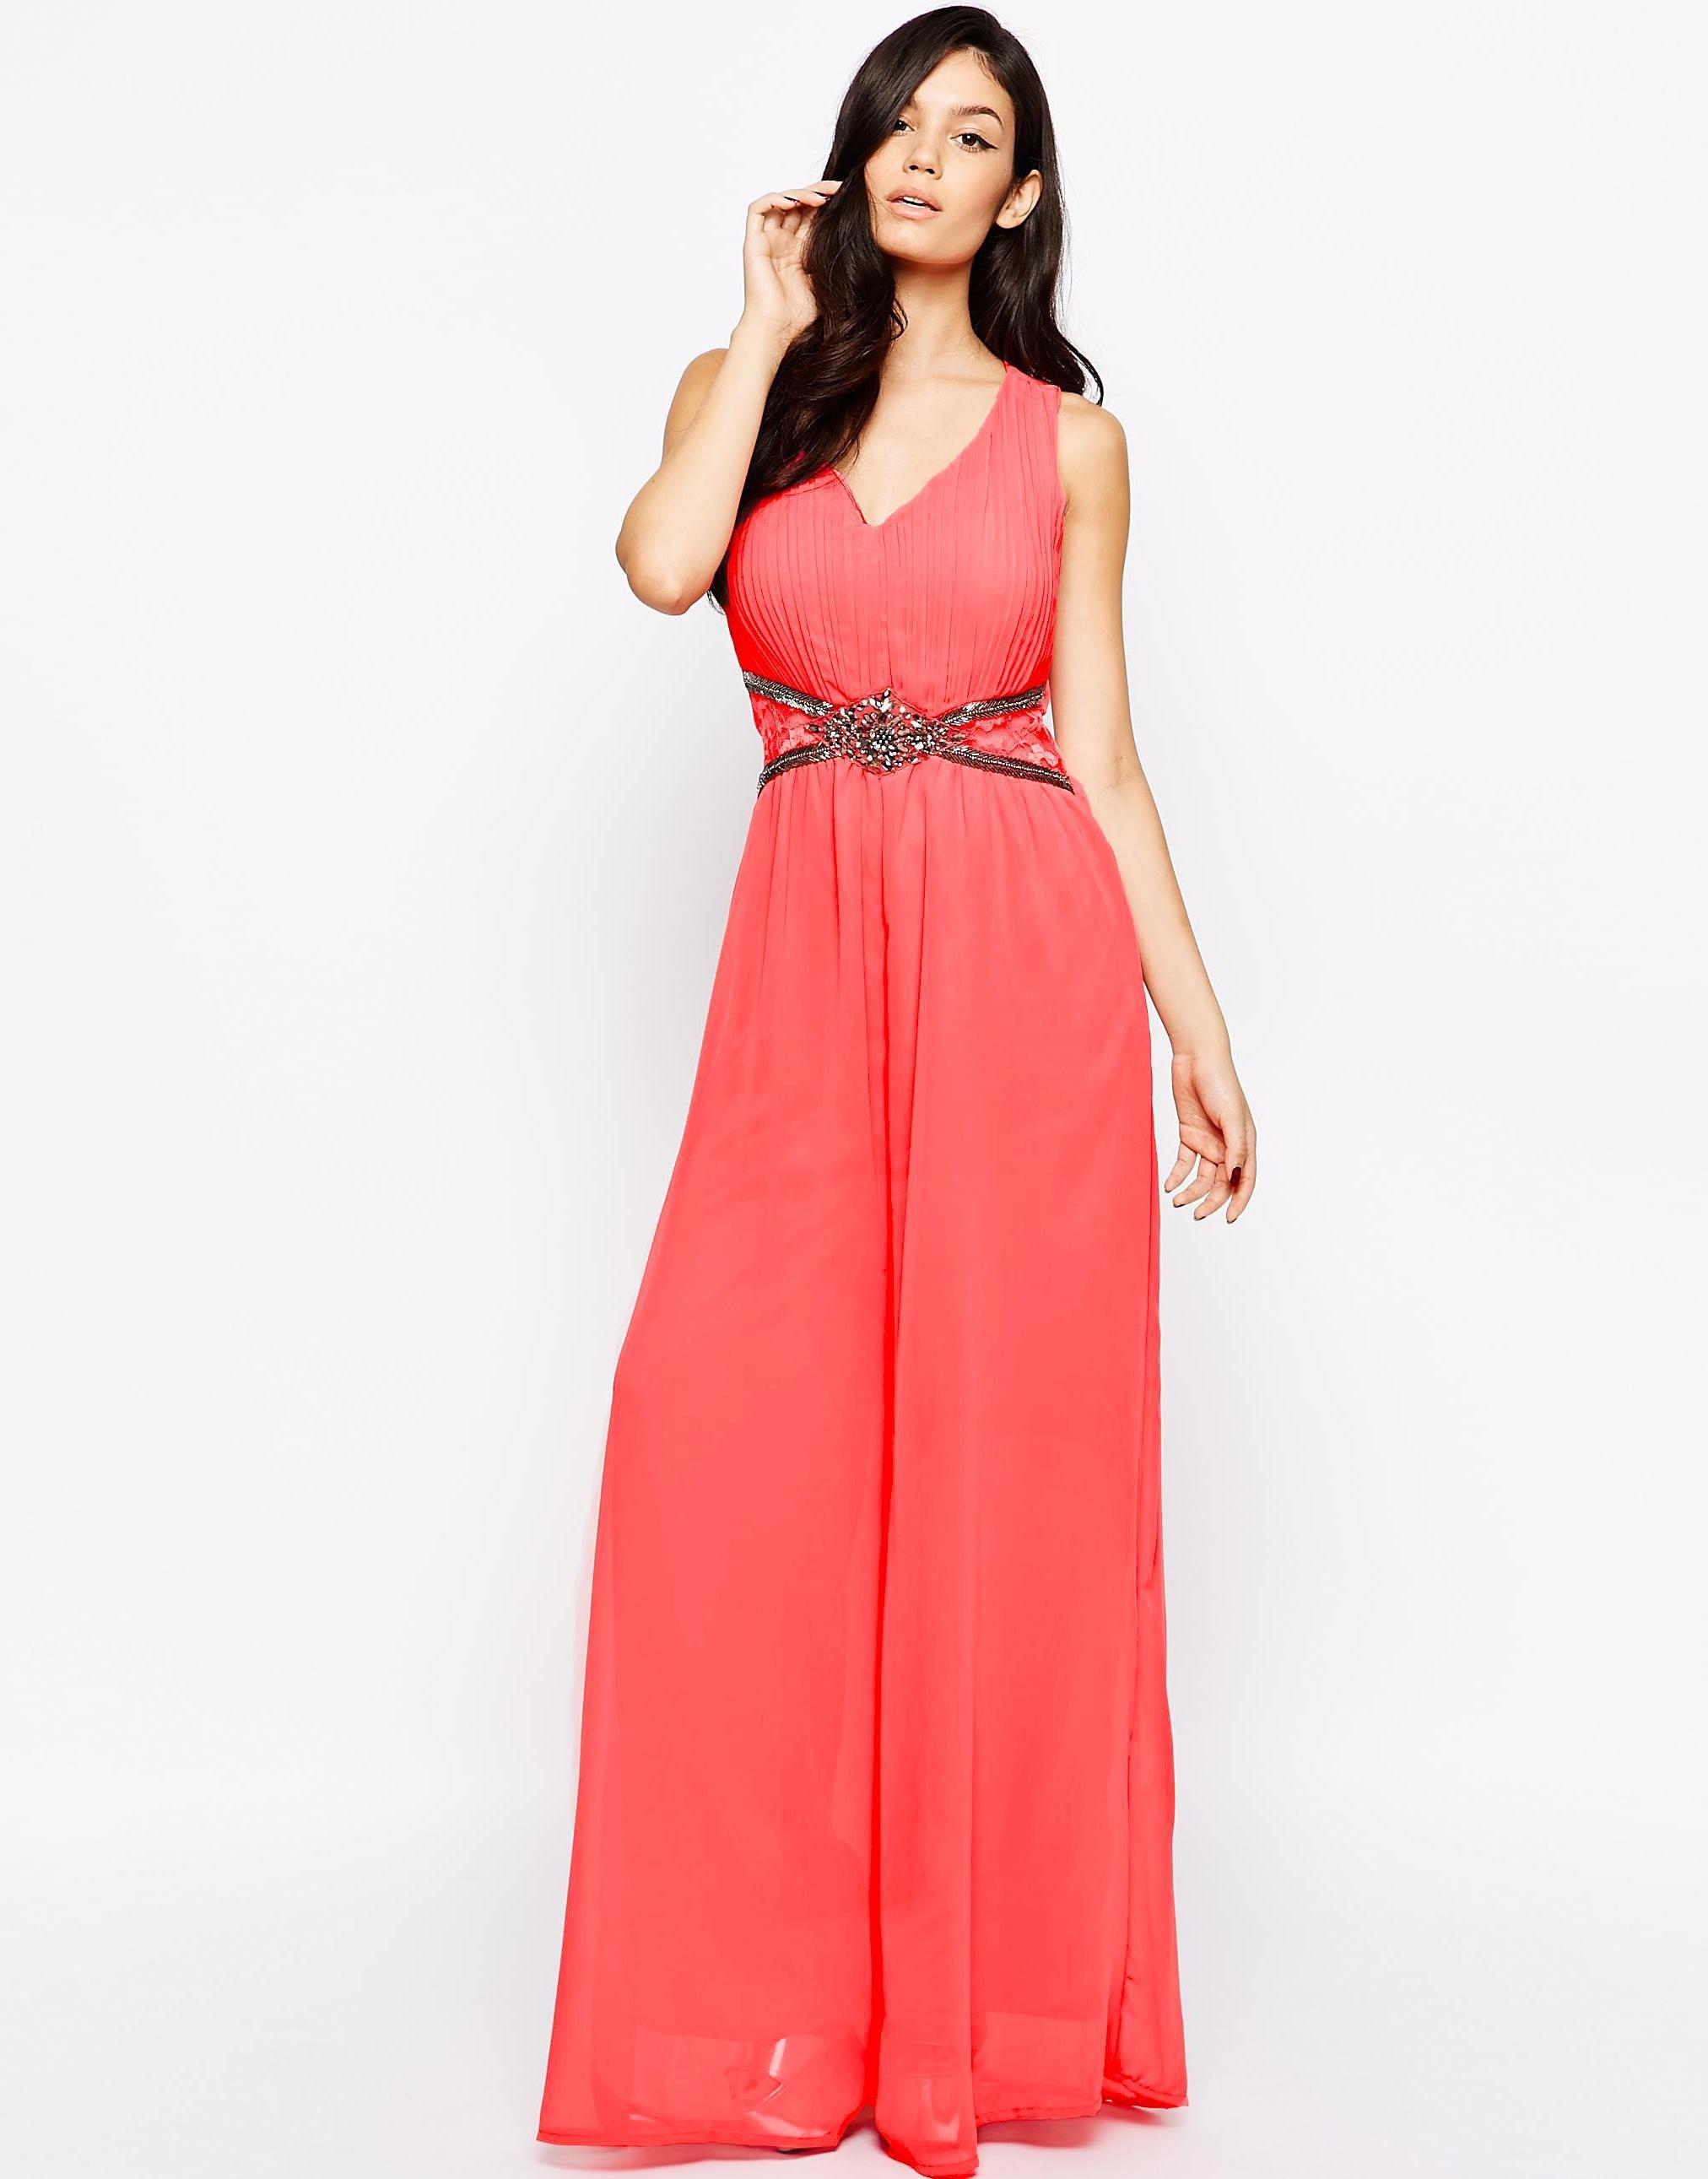 Turquoise Embellished Waist Maxi Dress | Little Mistress